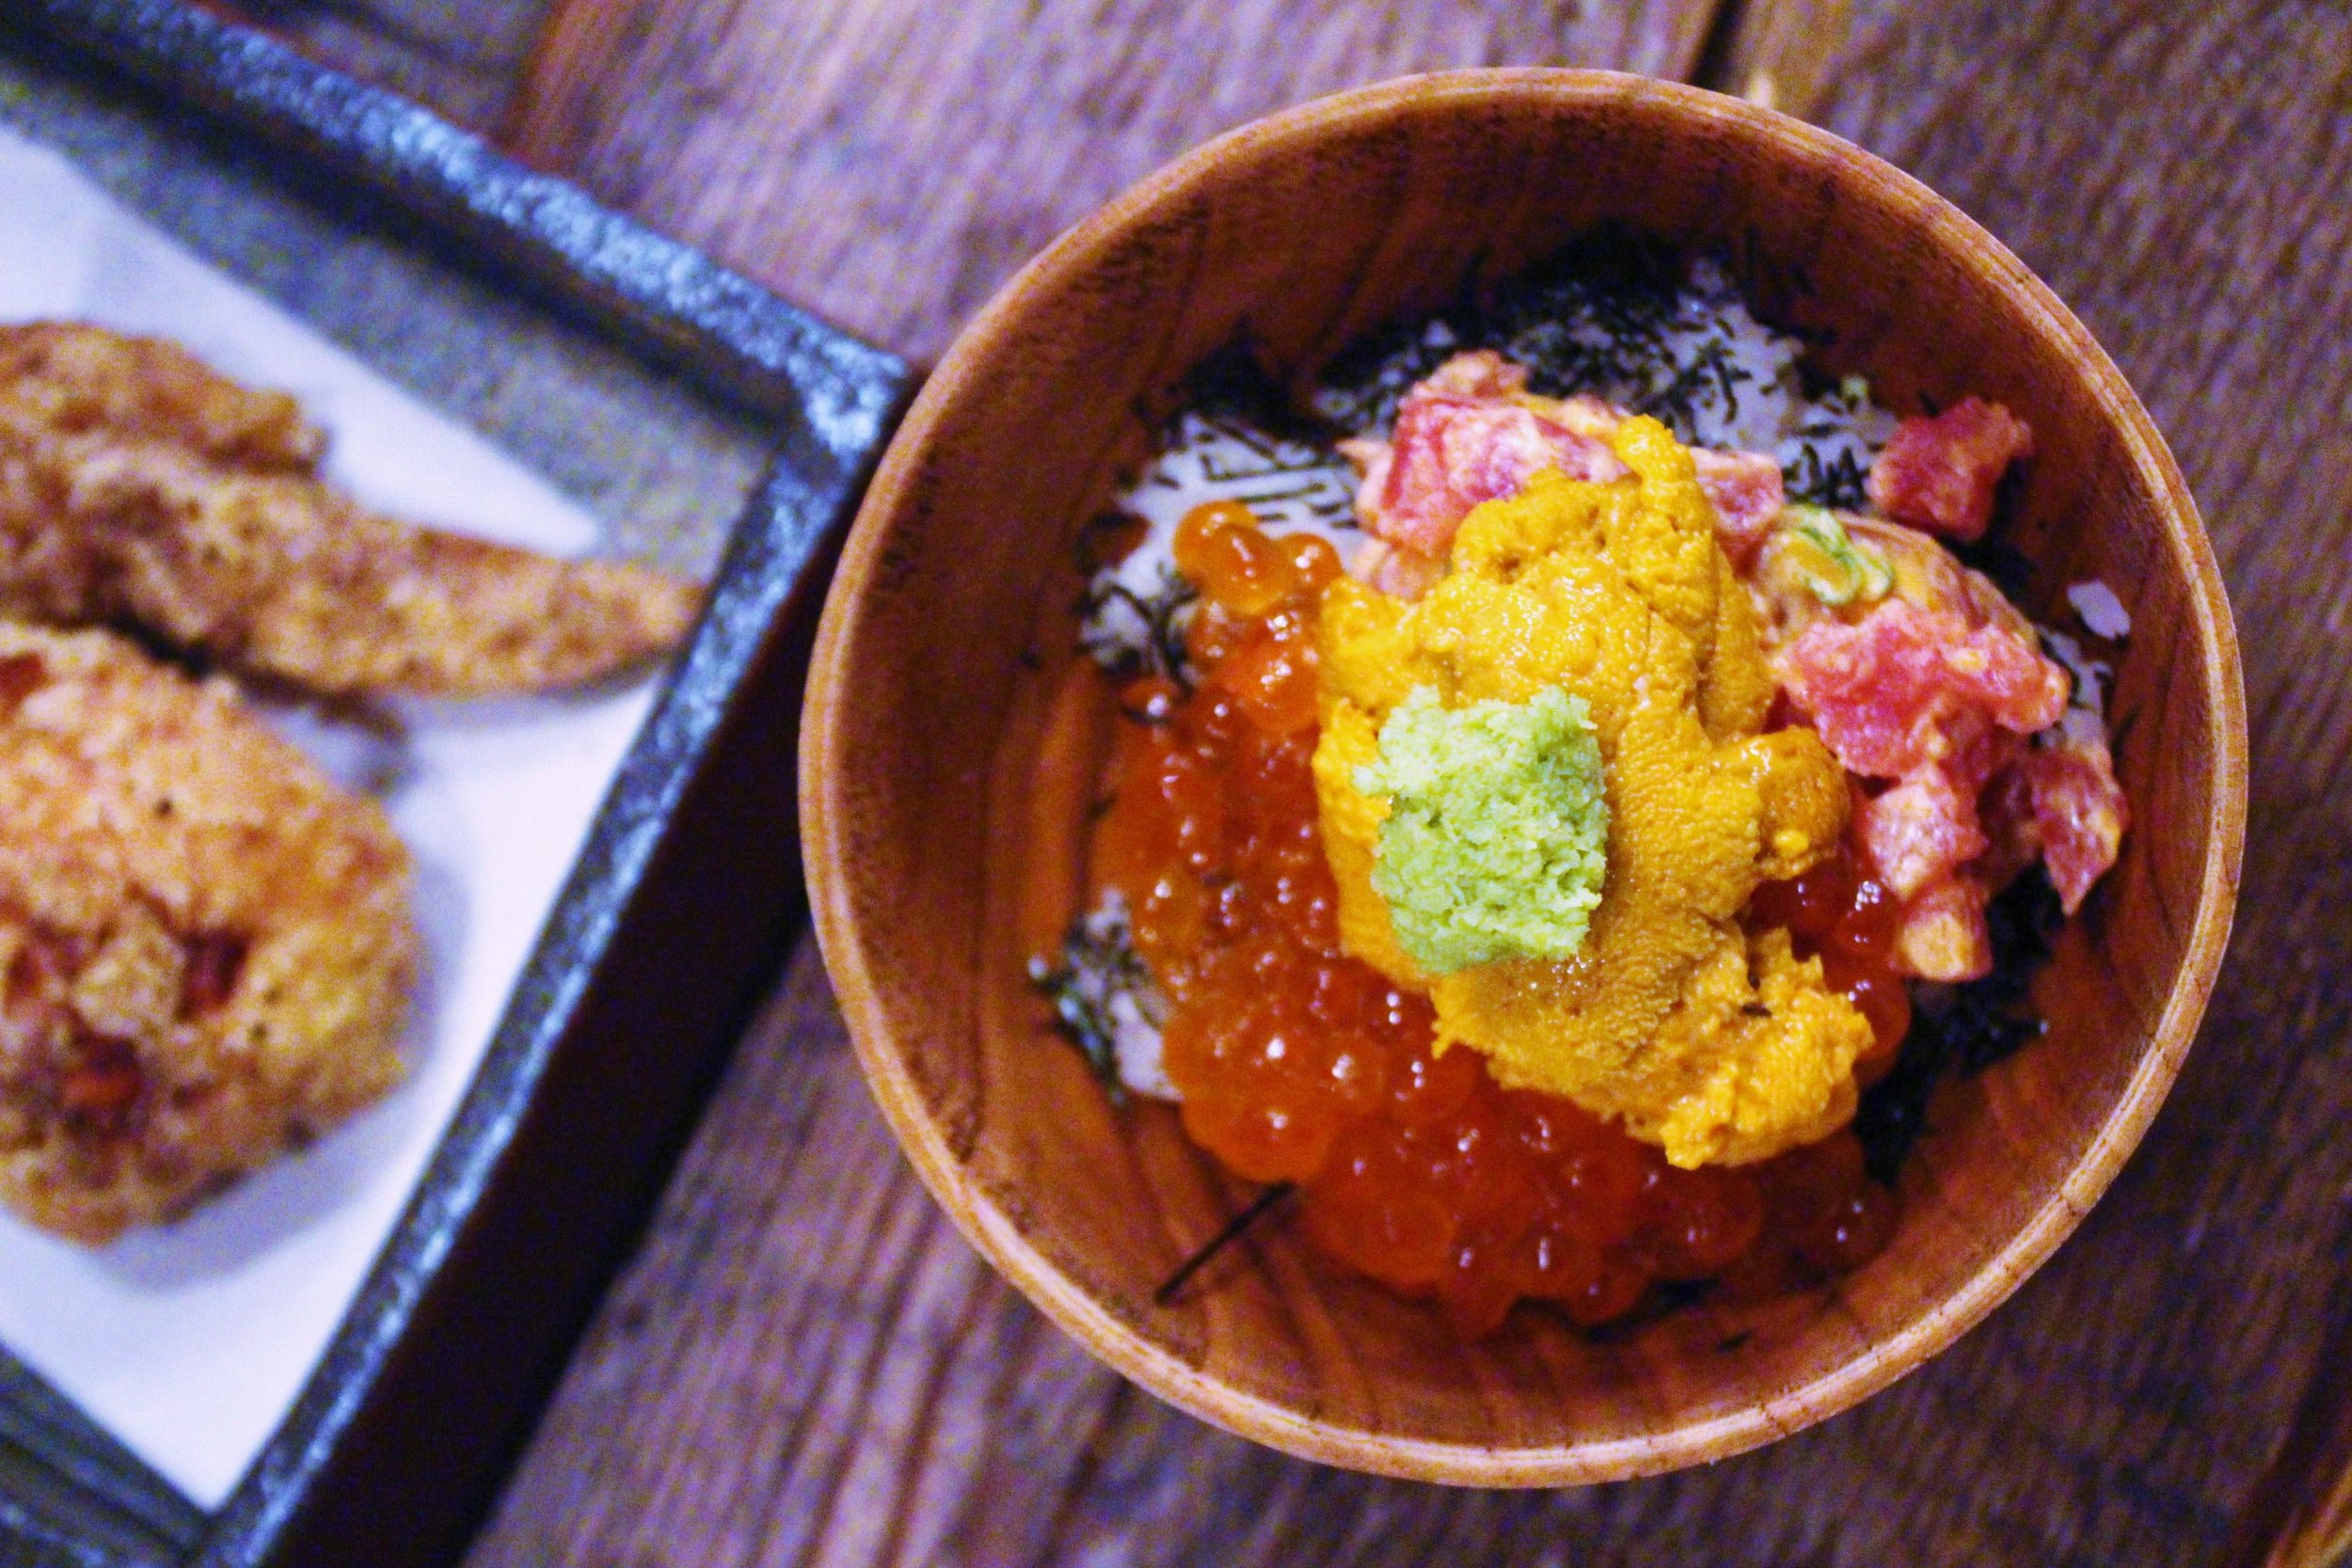 U&I: Uni, Spicy Maguro, Ikura, Sushi Rice, Sesame, Roasted Nori, and Wasabi